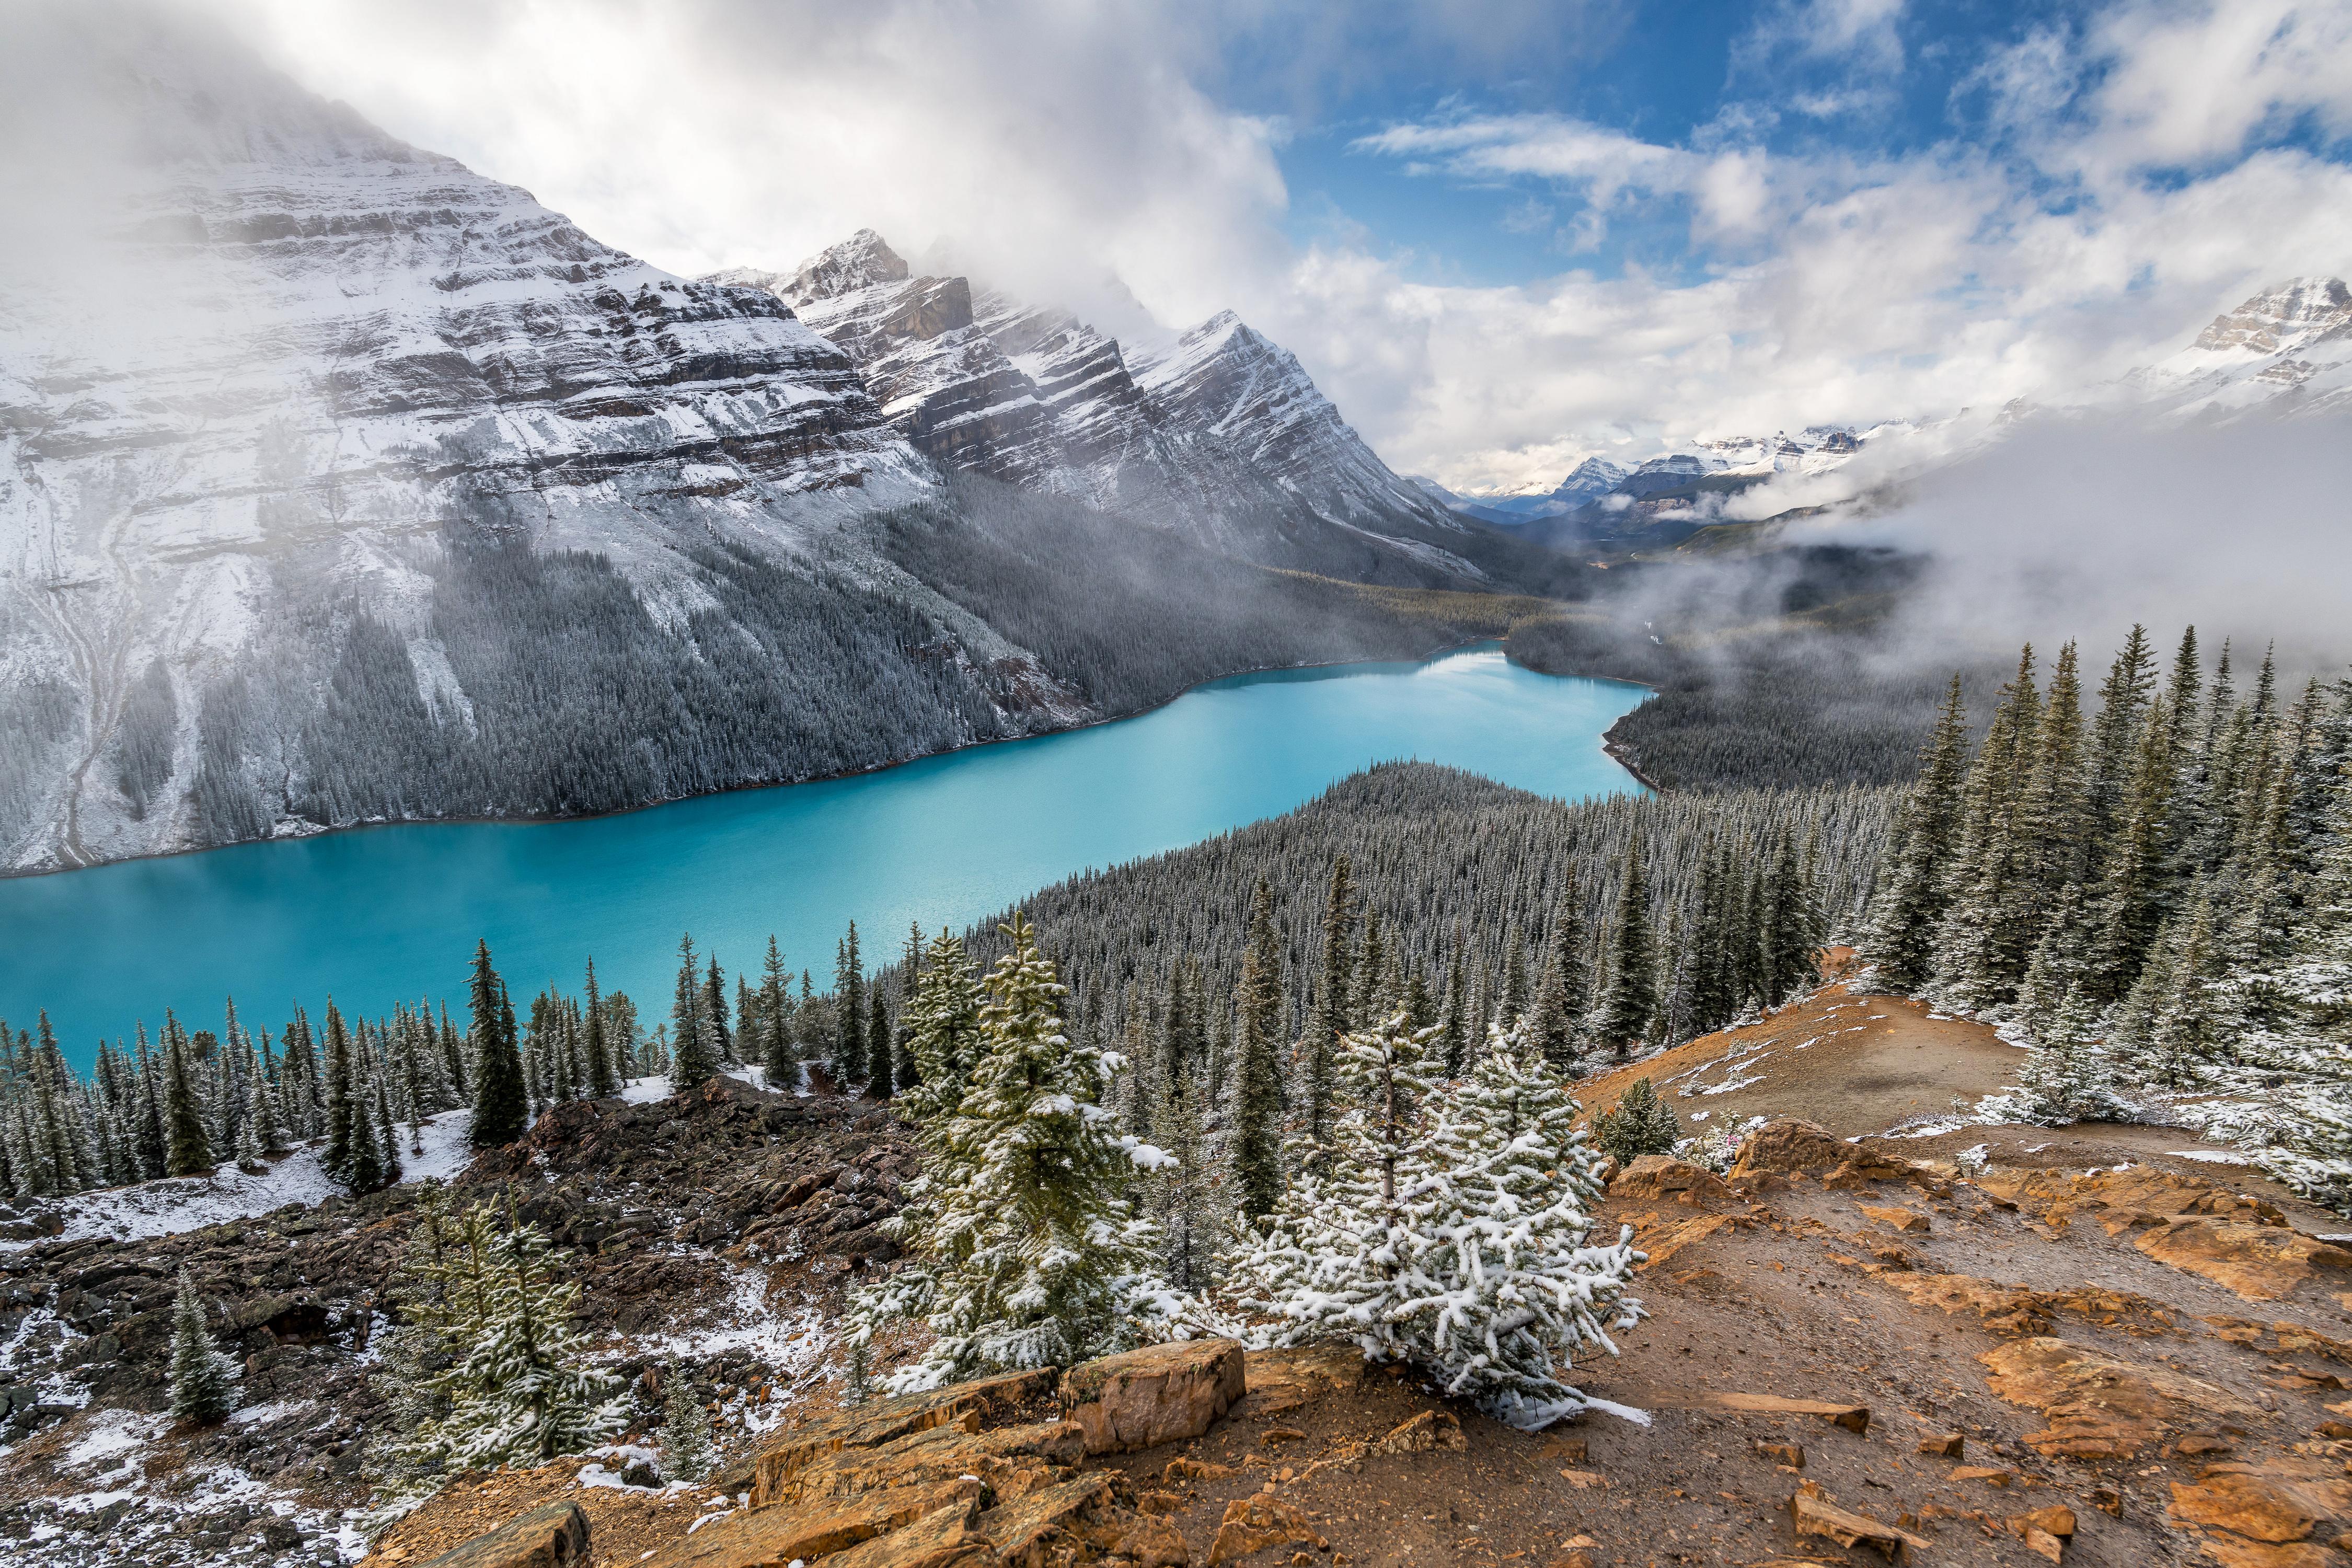 lake alberta scenery 4k 1615197314 - Lake Alberta Scenery 4k - Lake Alberta Scenery 4k wallpapers